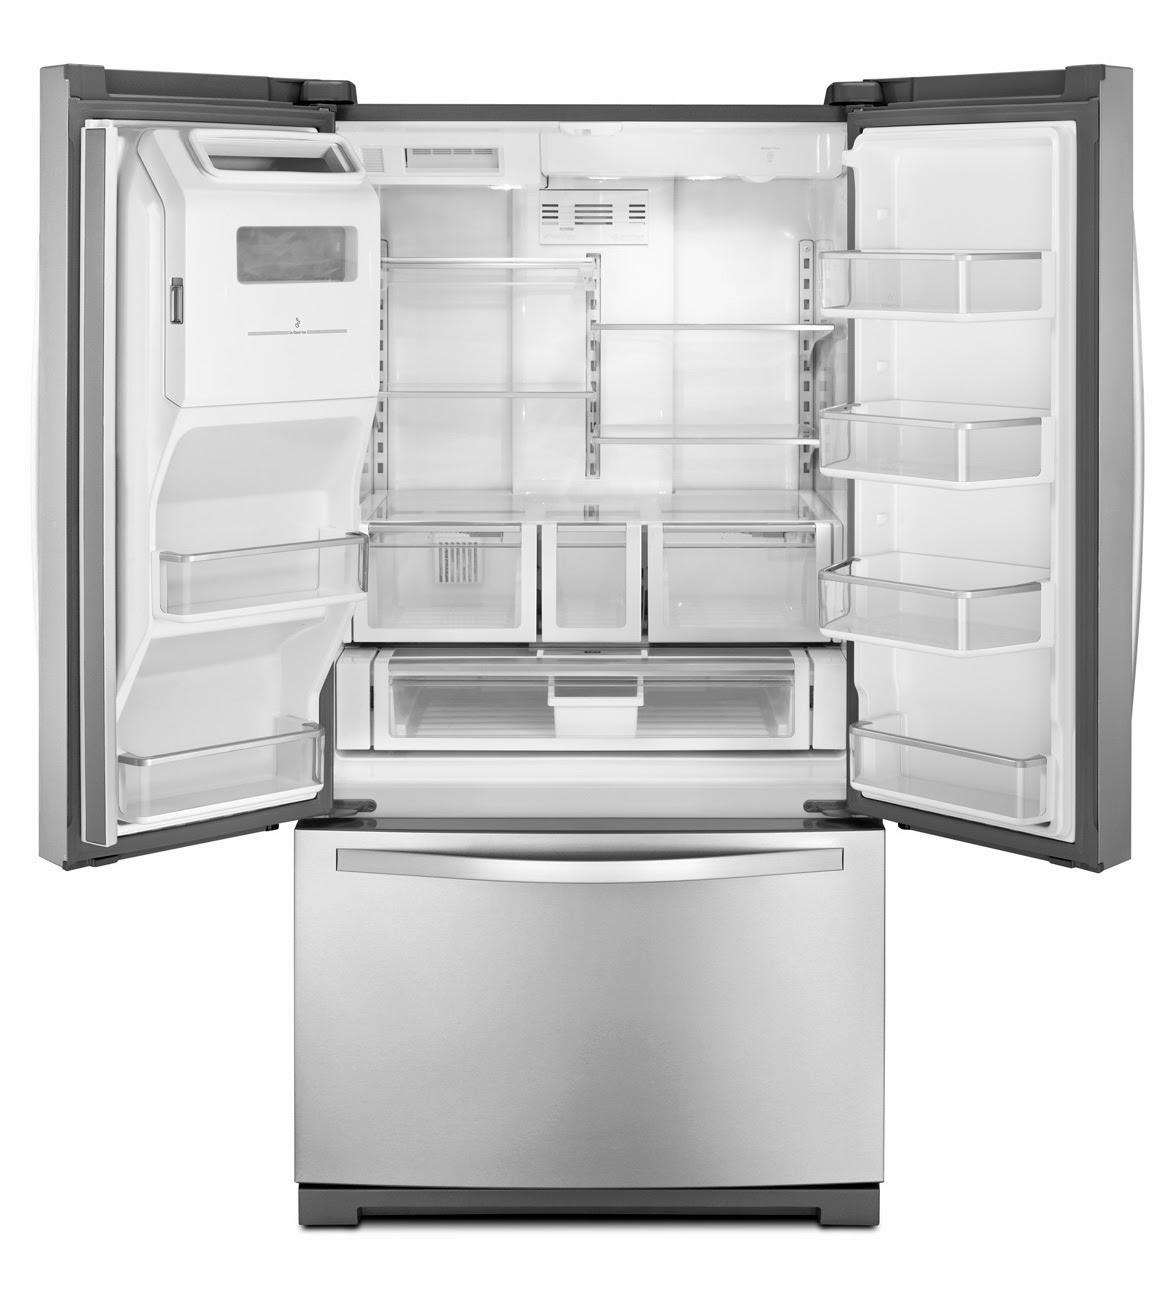 Whirlpool Refrigerator Brand Whirlpool Wrf989sdaf